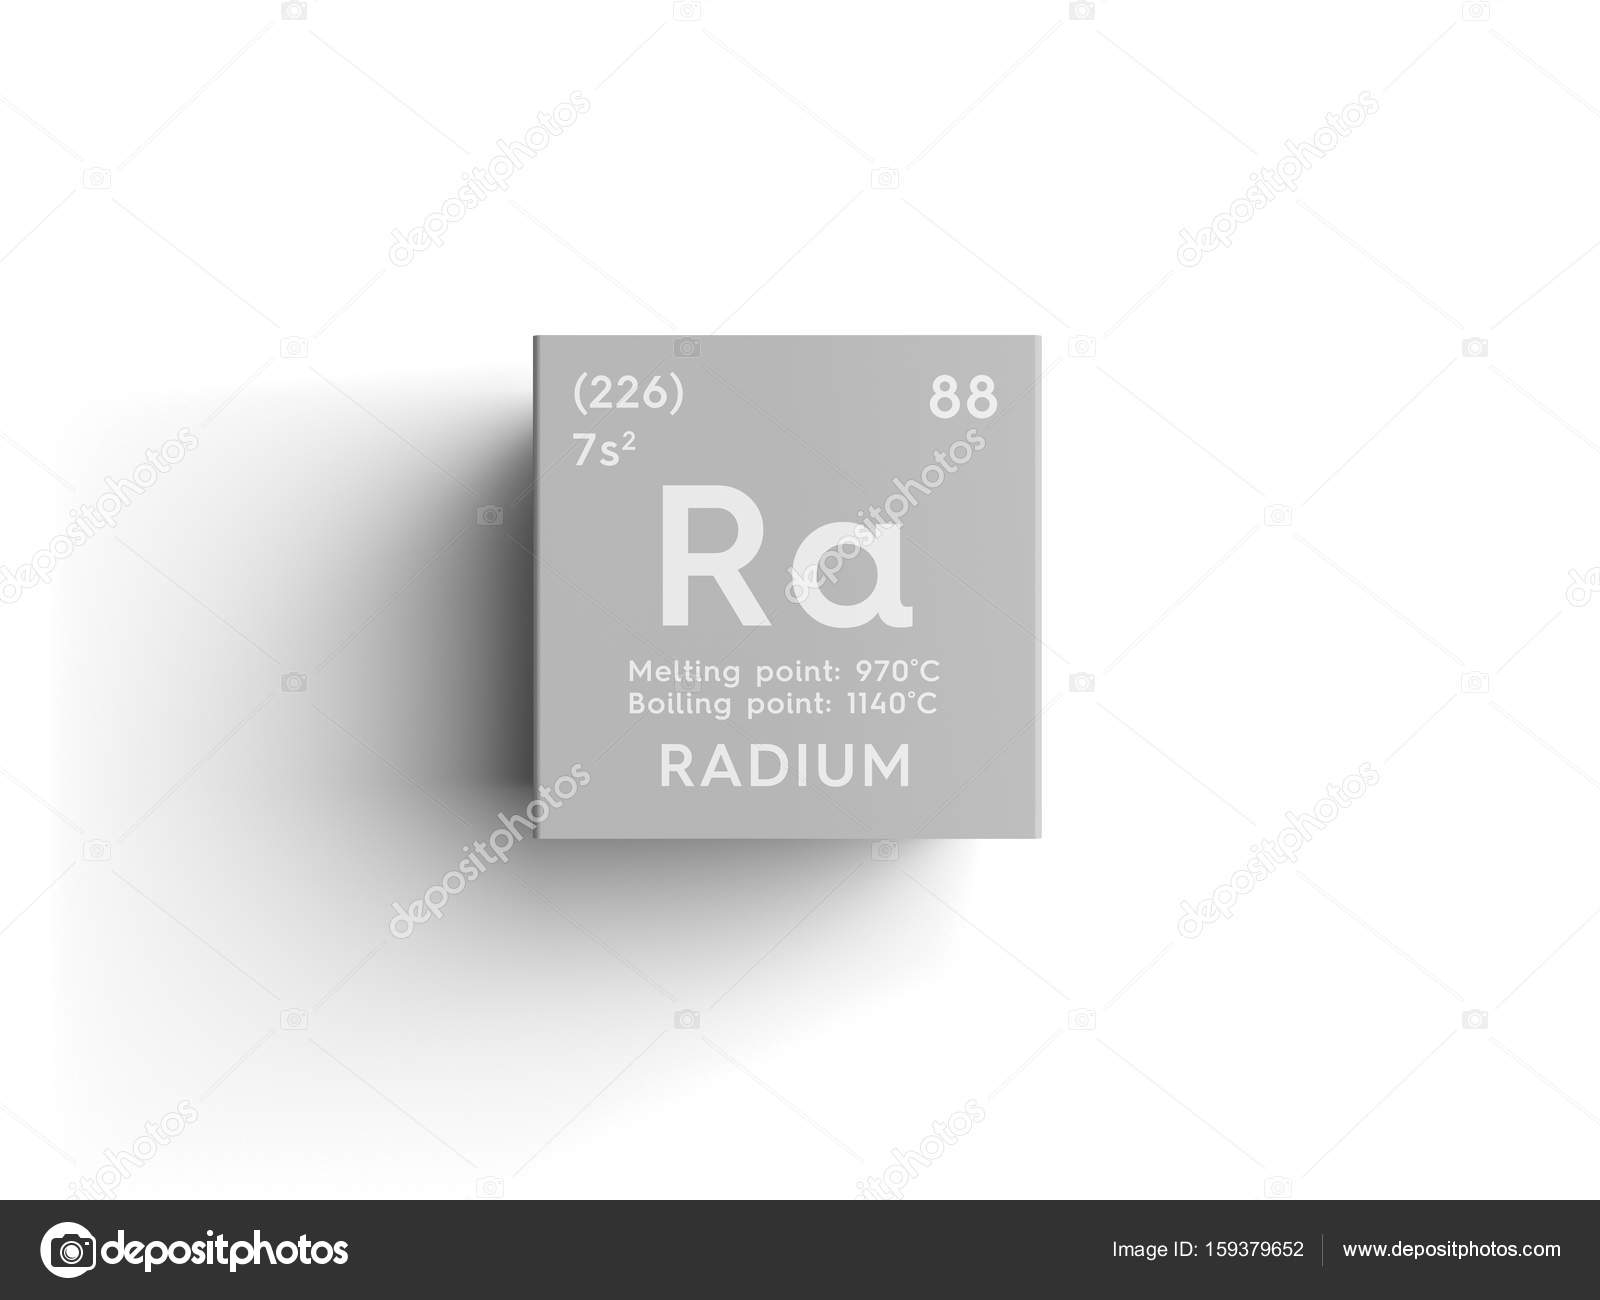 Radium Alkaline Earth Metals Chemical Element Of Mendeleevs